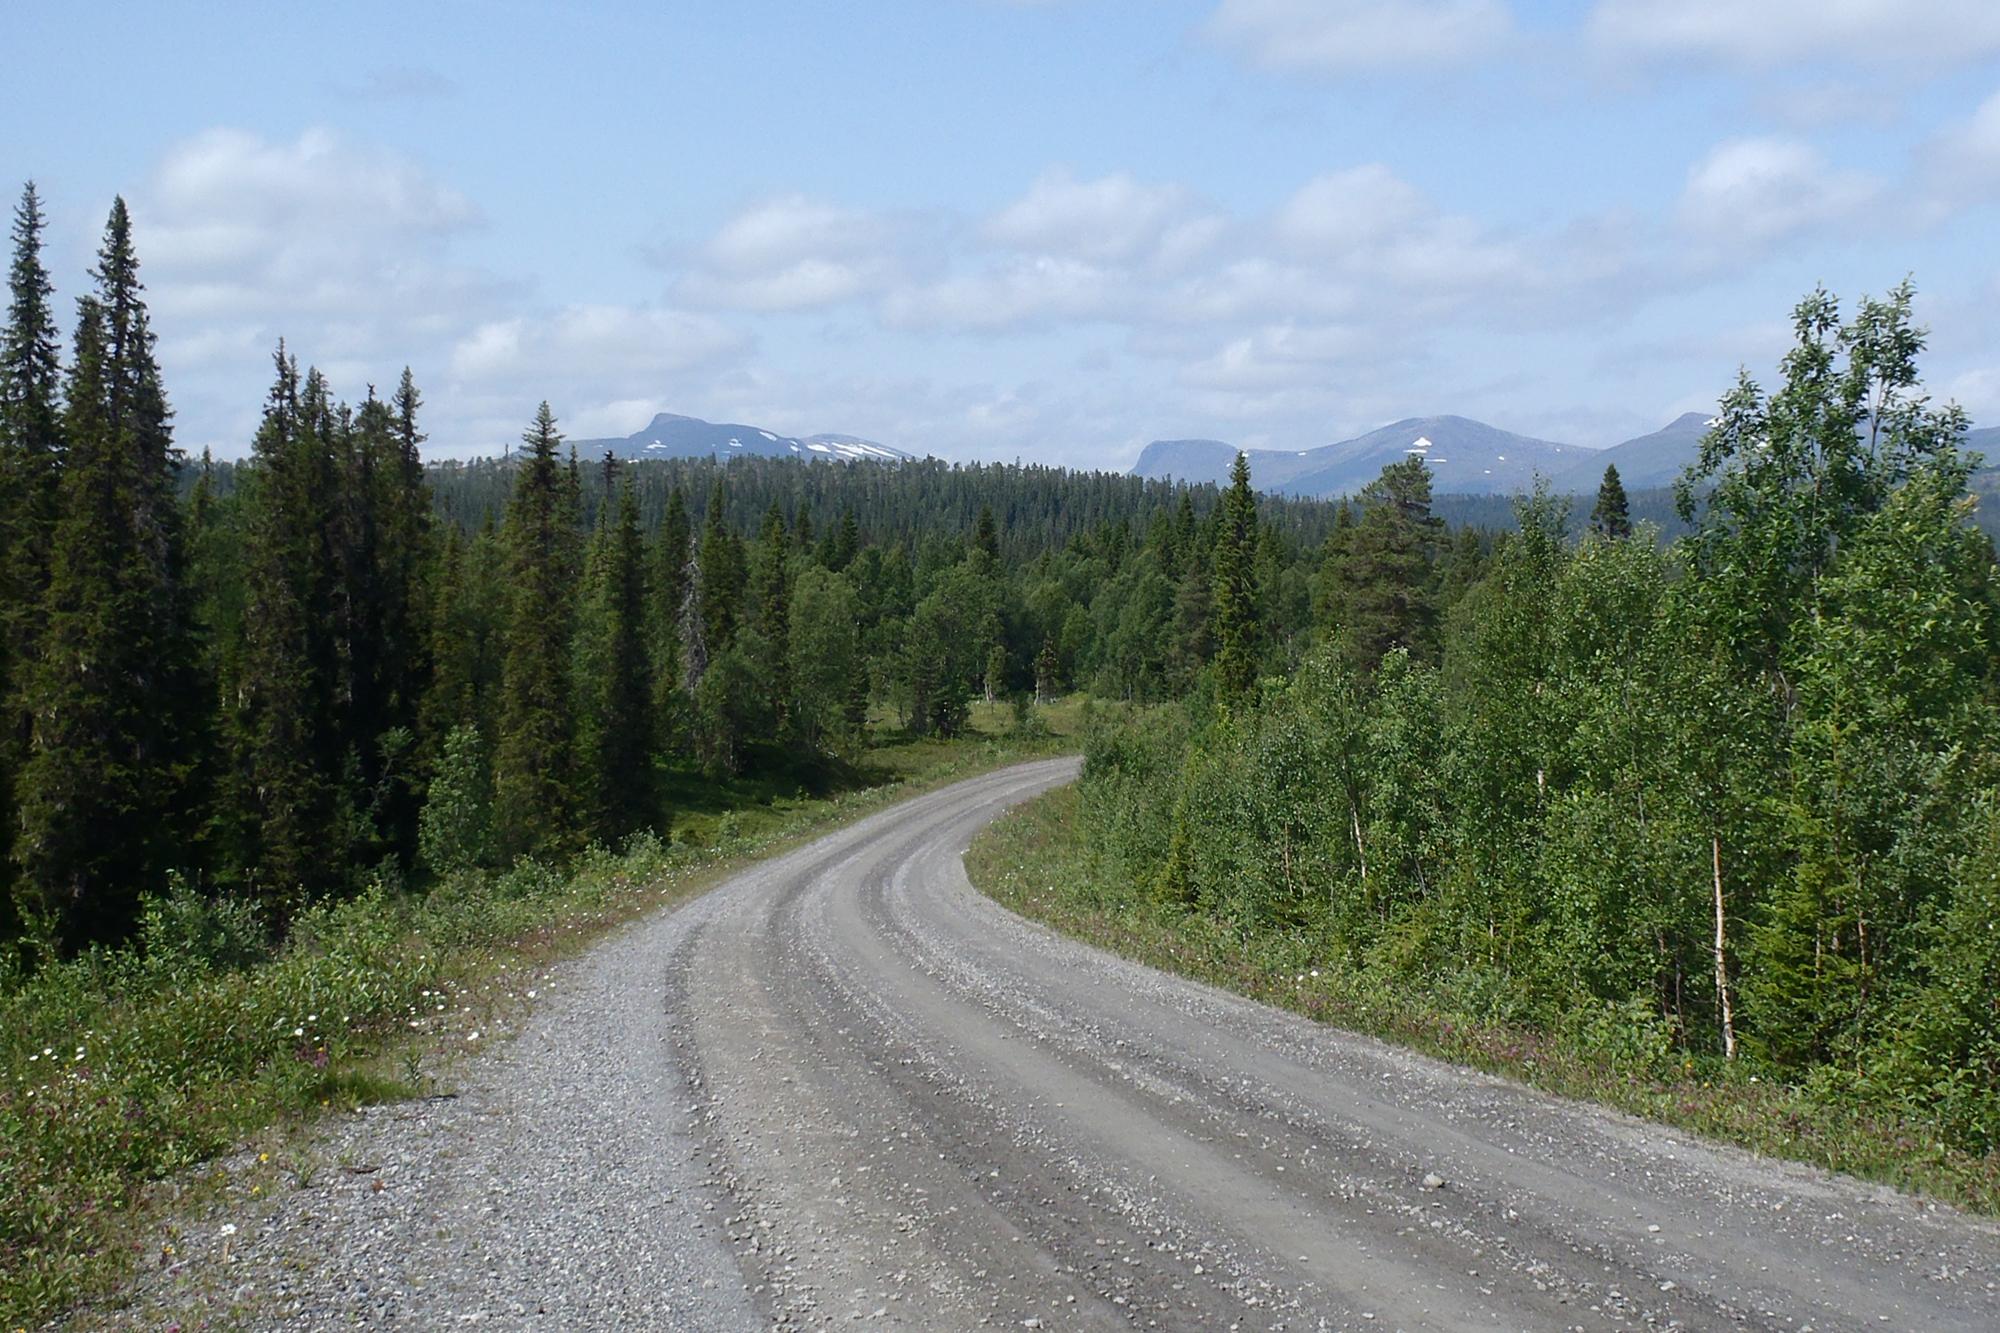 Stage 2 - Hard grind on roads